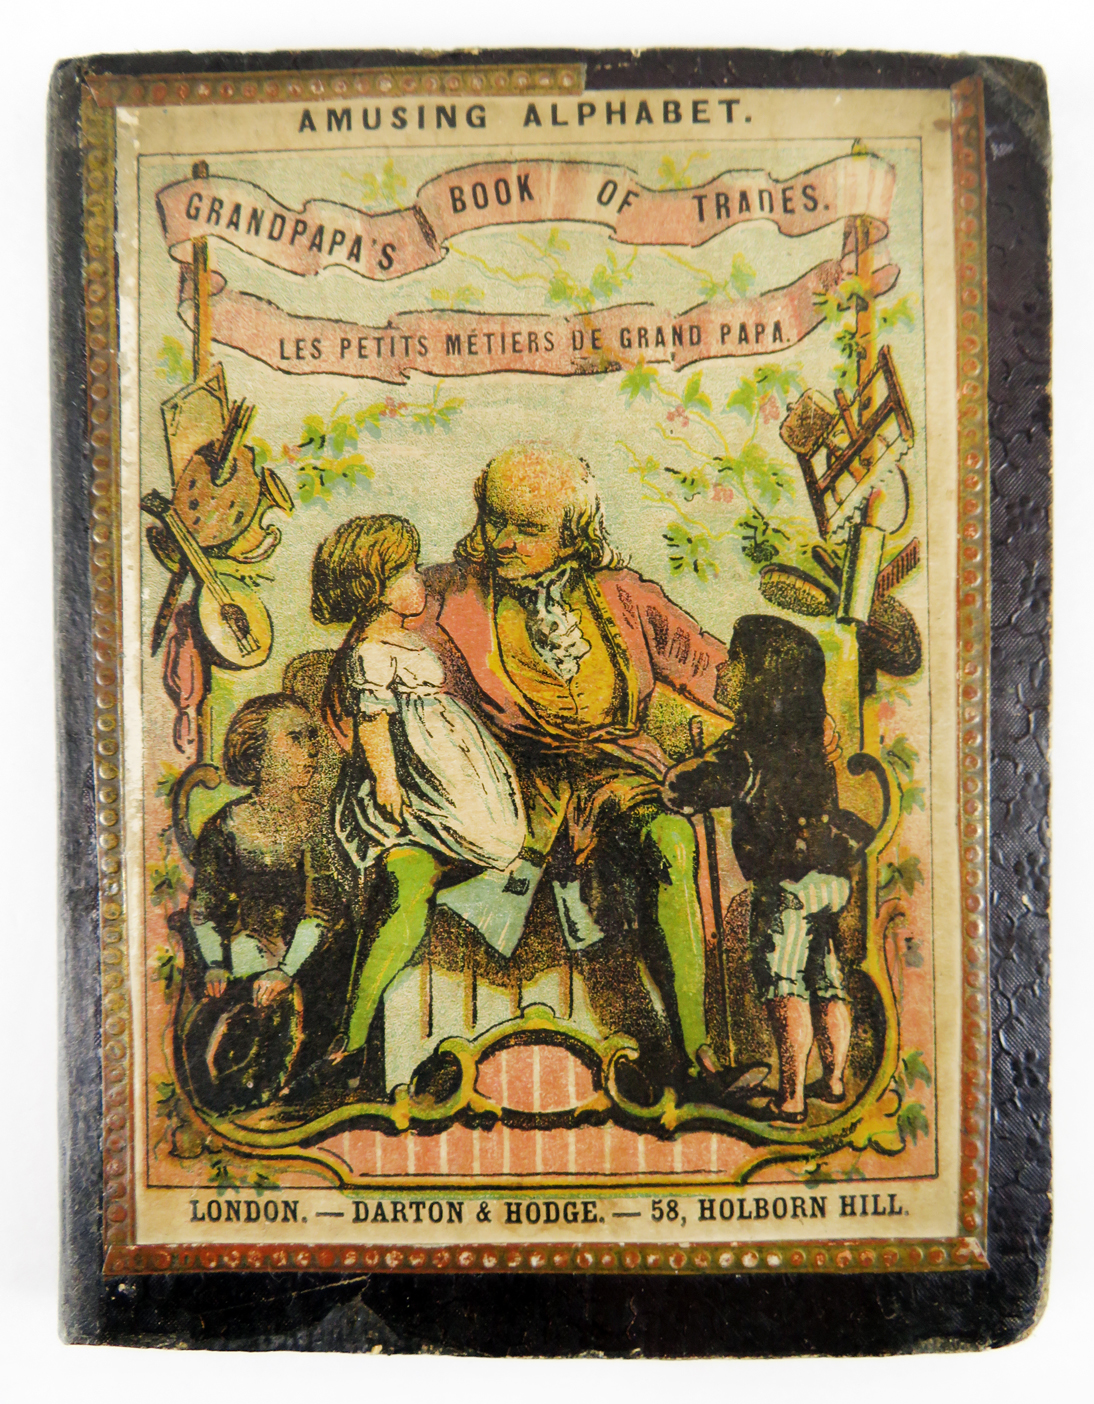 Darton & Hodge | Cotsen Children's Library